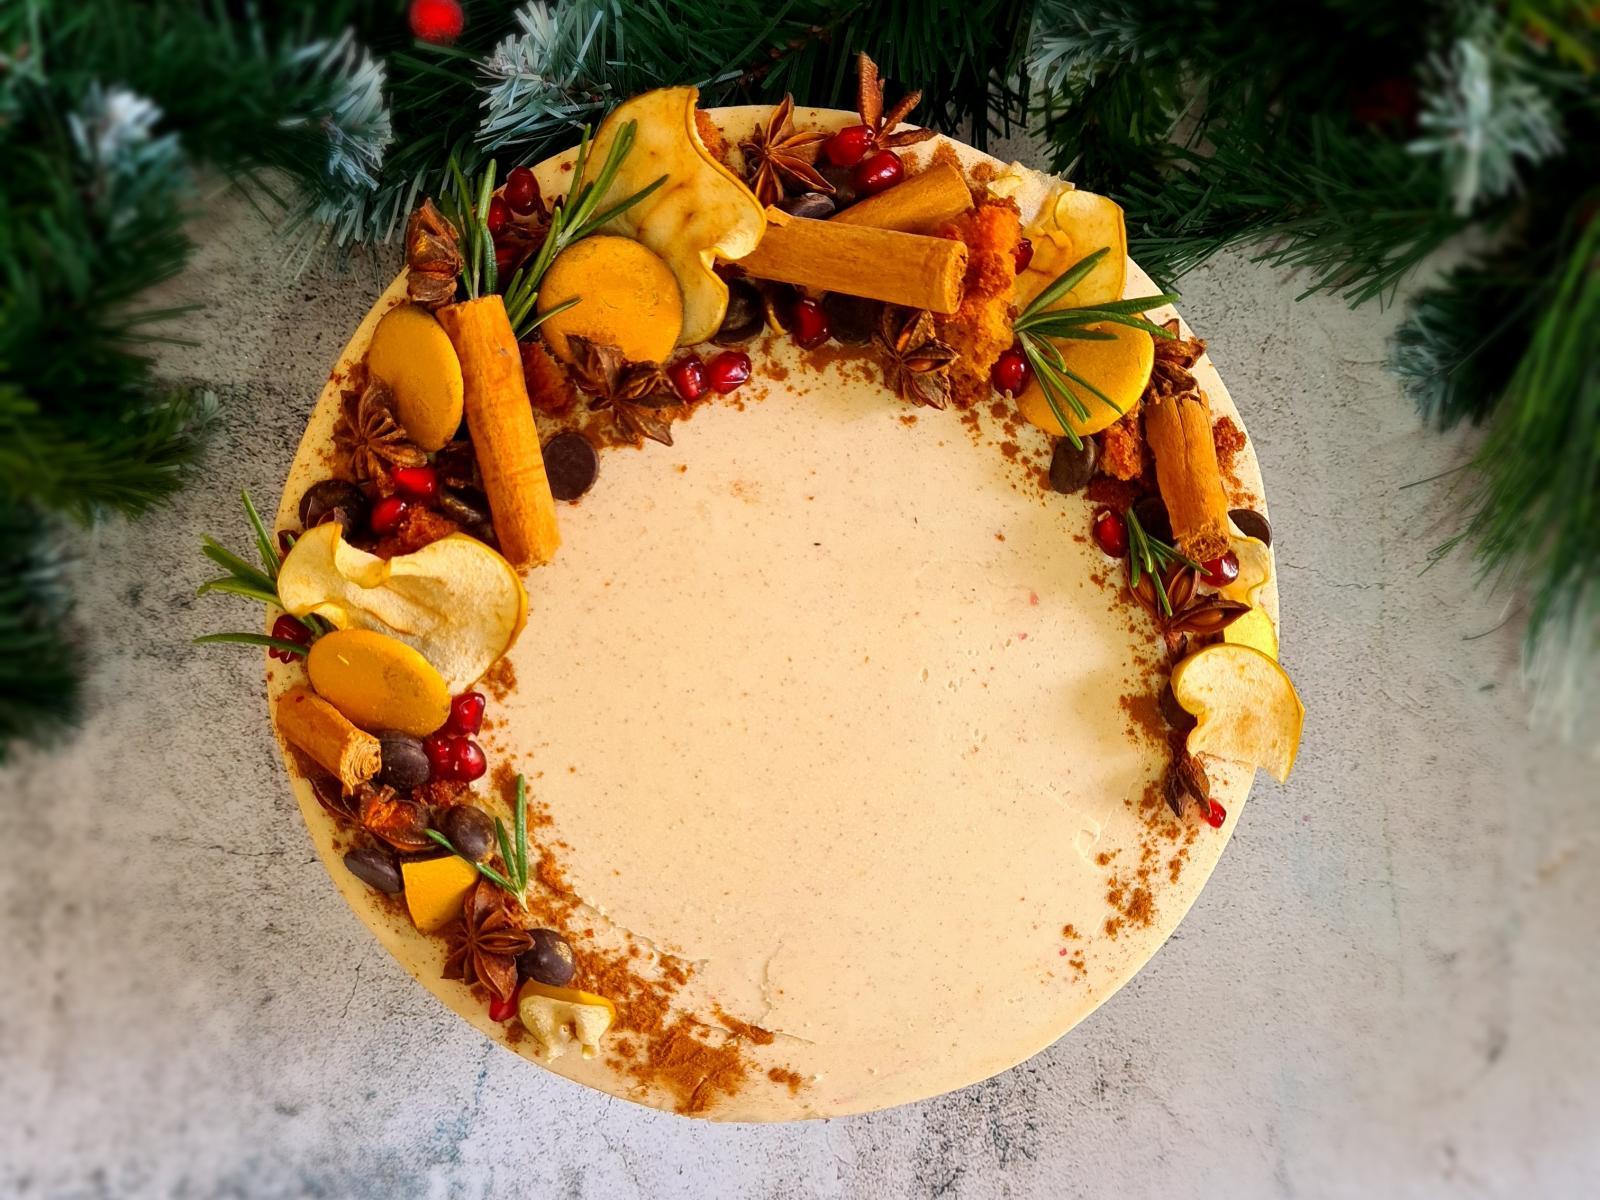 Luminary Bakery's Spiced Apple Christmas Cake - what a treat!